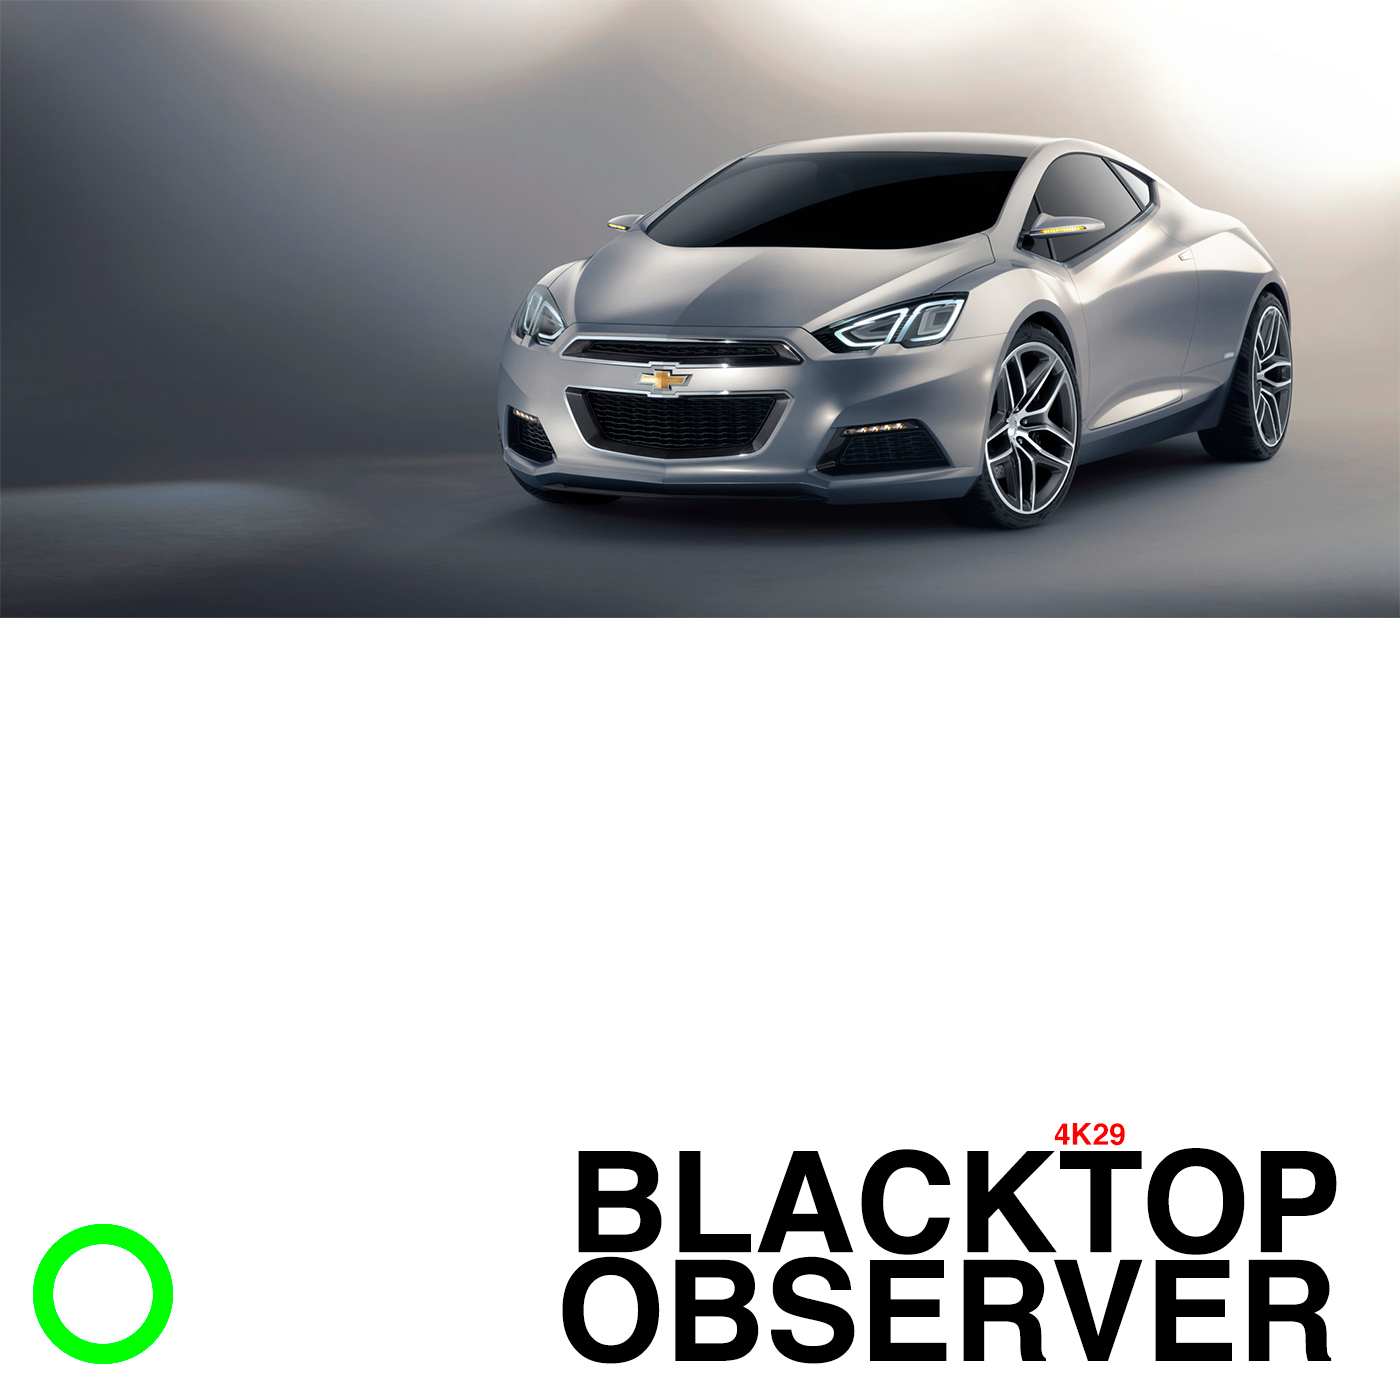 BLACKTOP OBSERVER 4K29